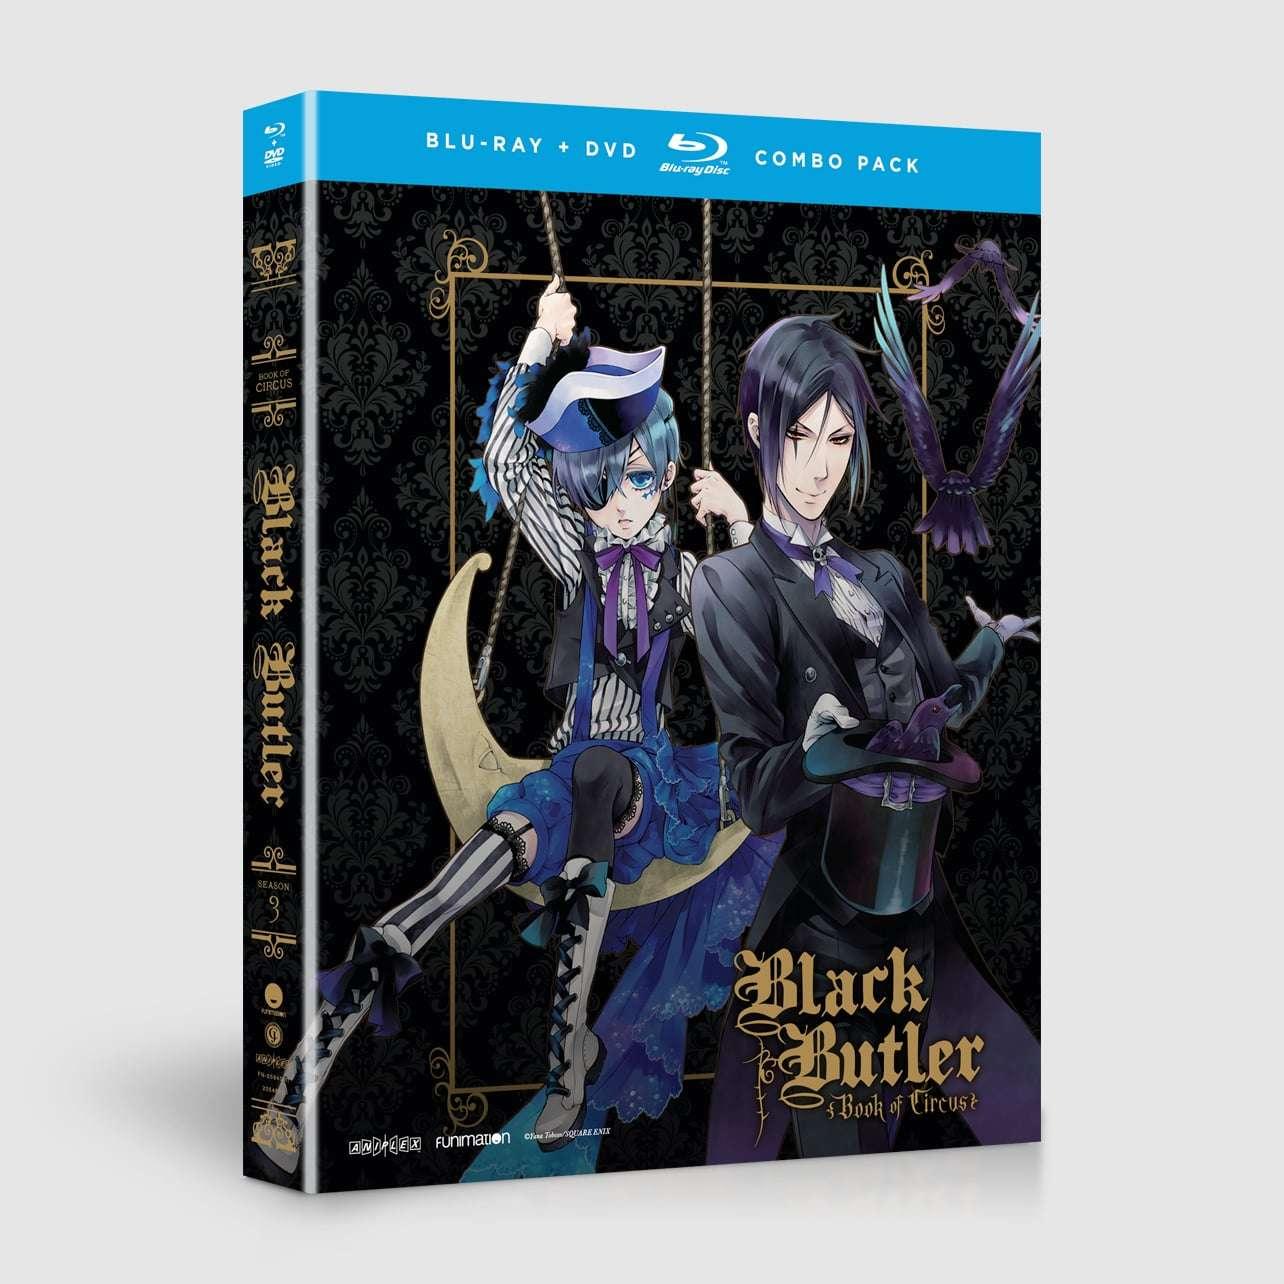 Black butler season 3 release date